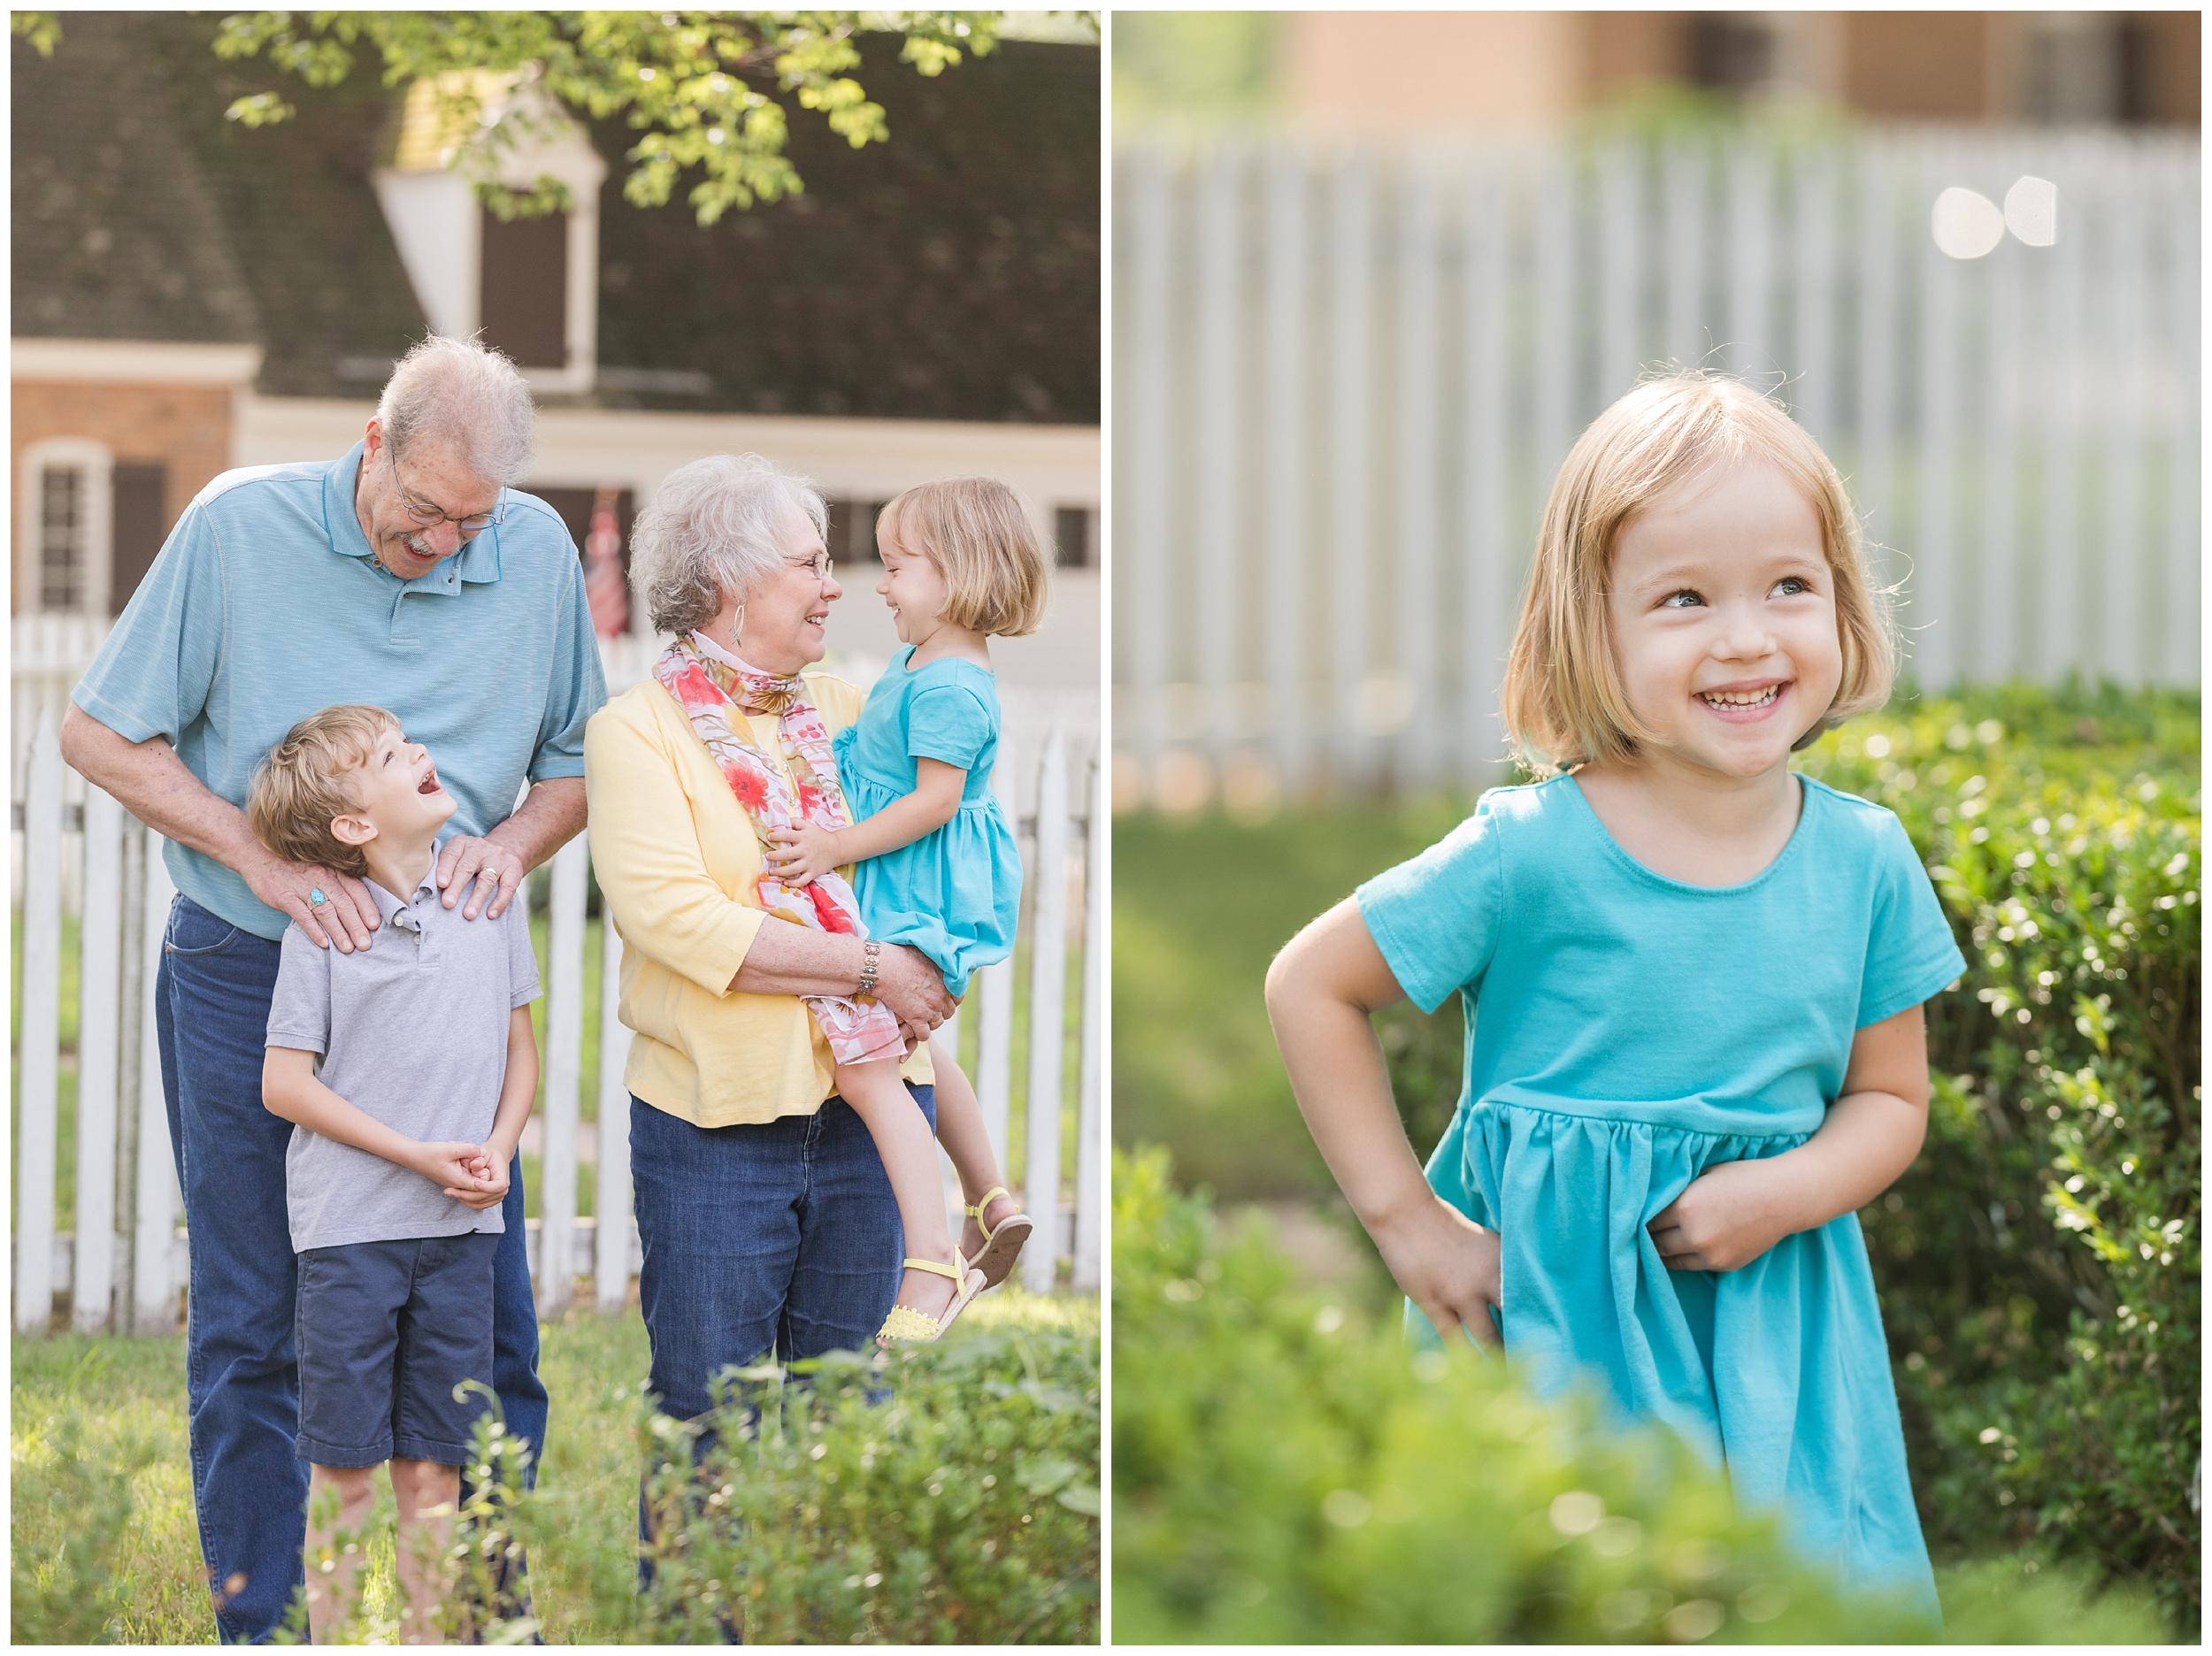 williamsburg family photography by elovephotos_0002.jpg